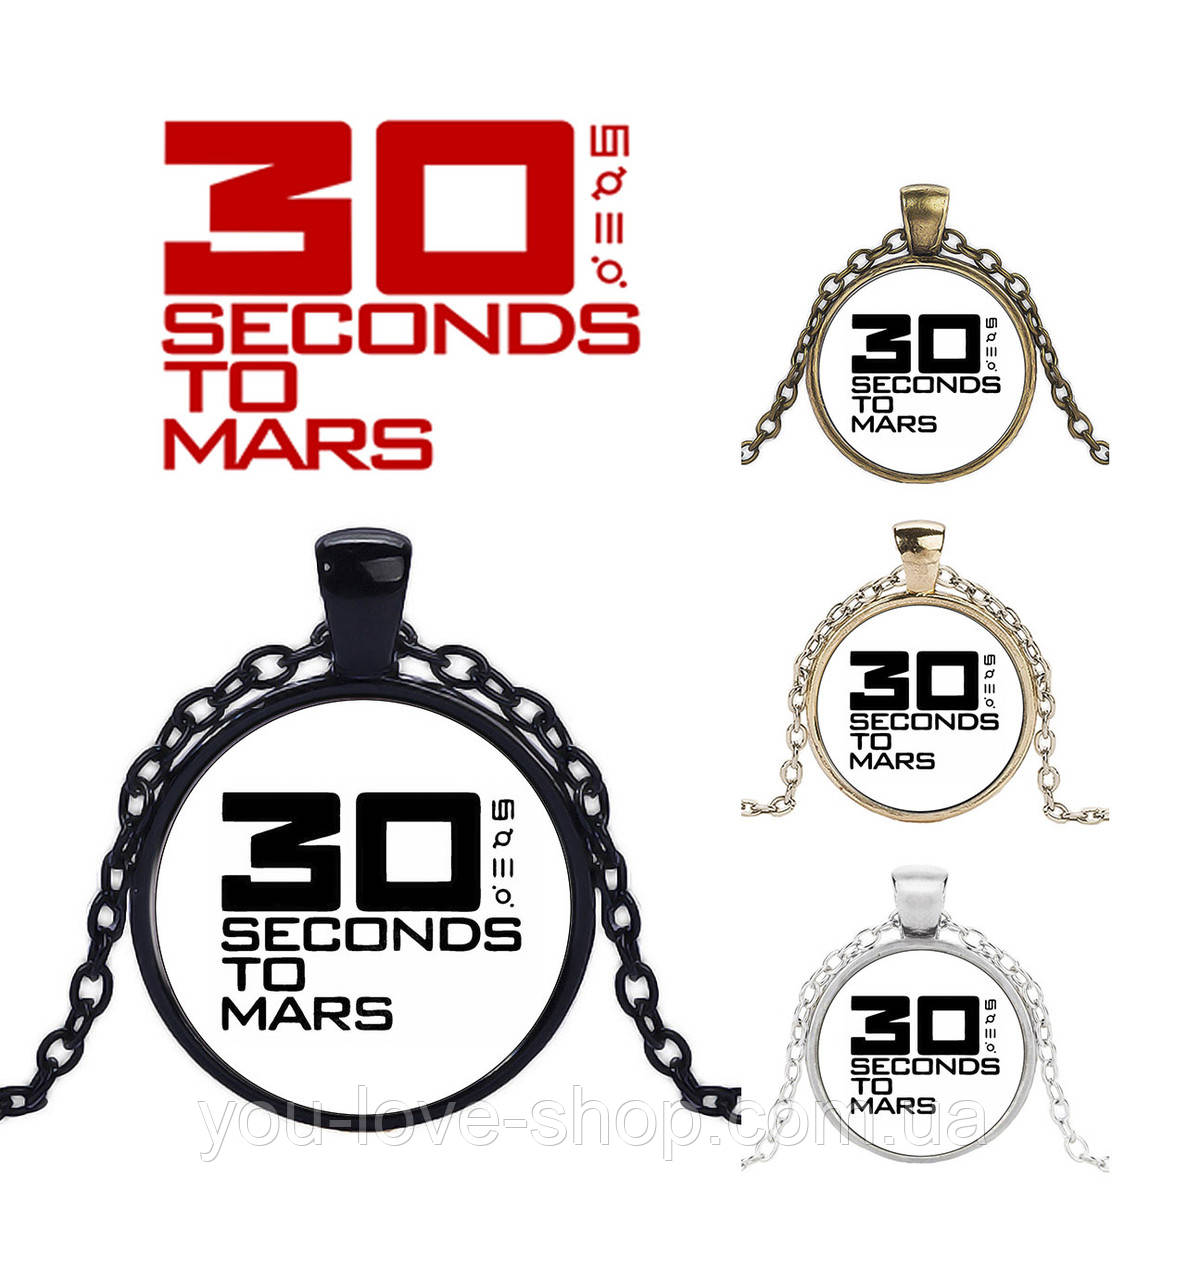 Кулон 30 seconds to Mars с логотипом группы